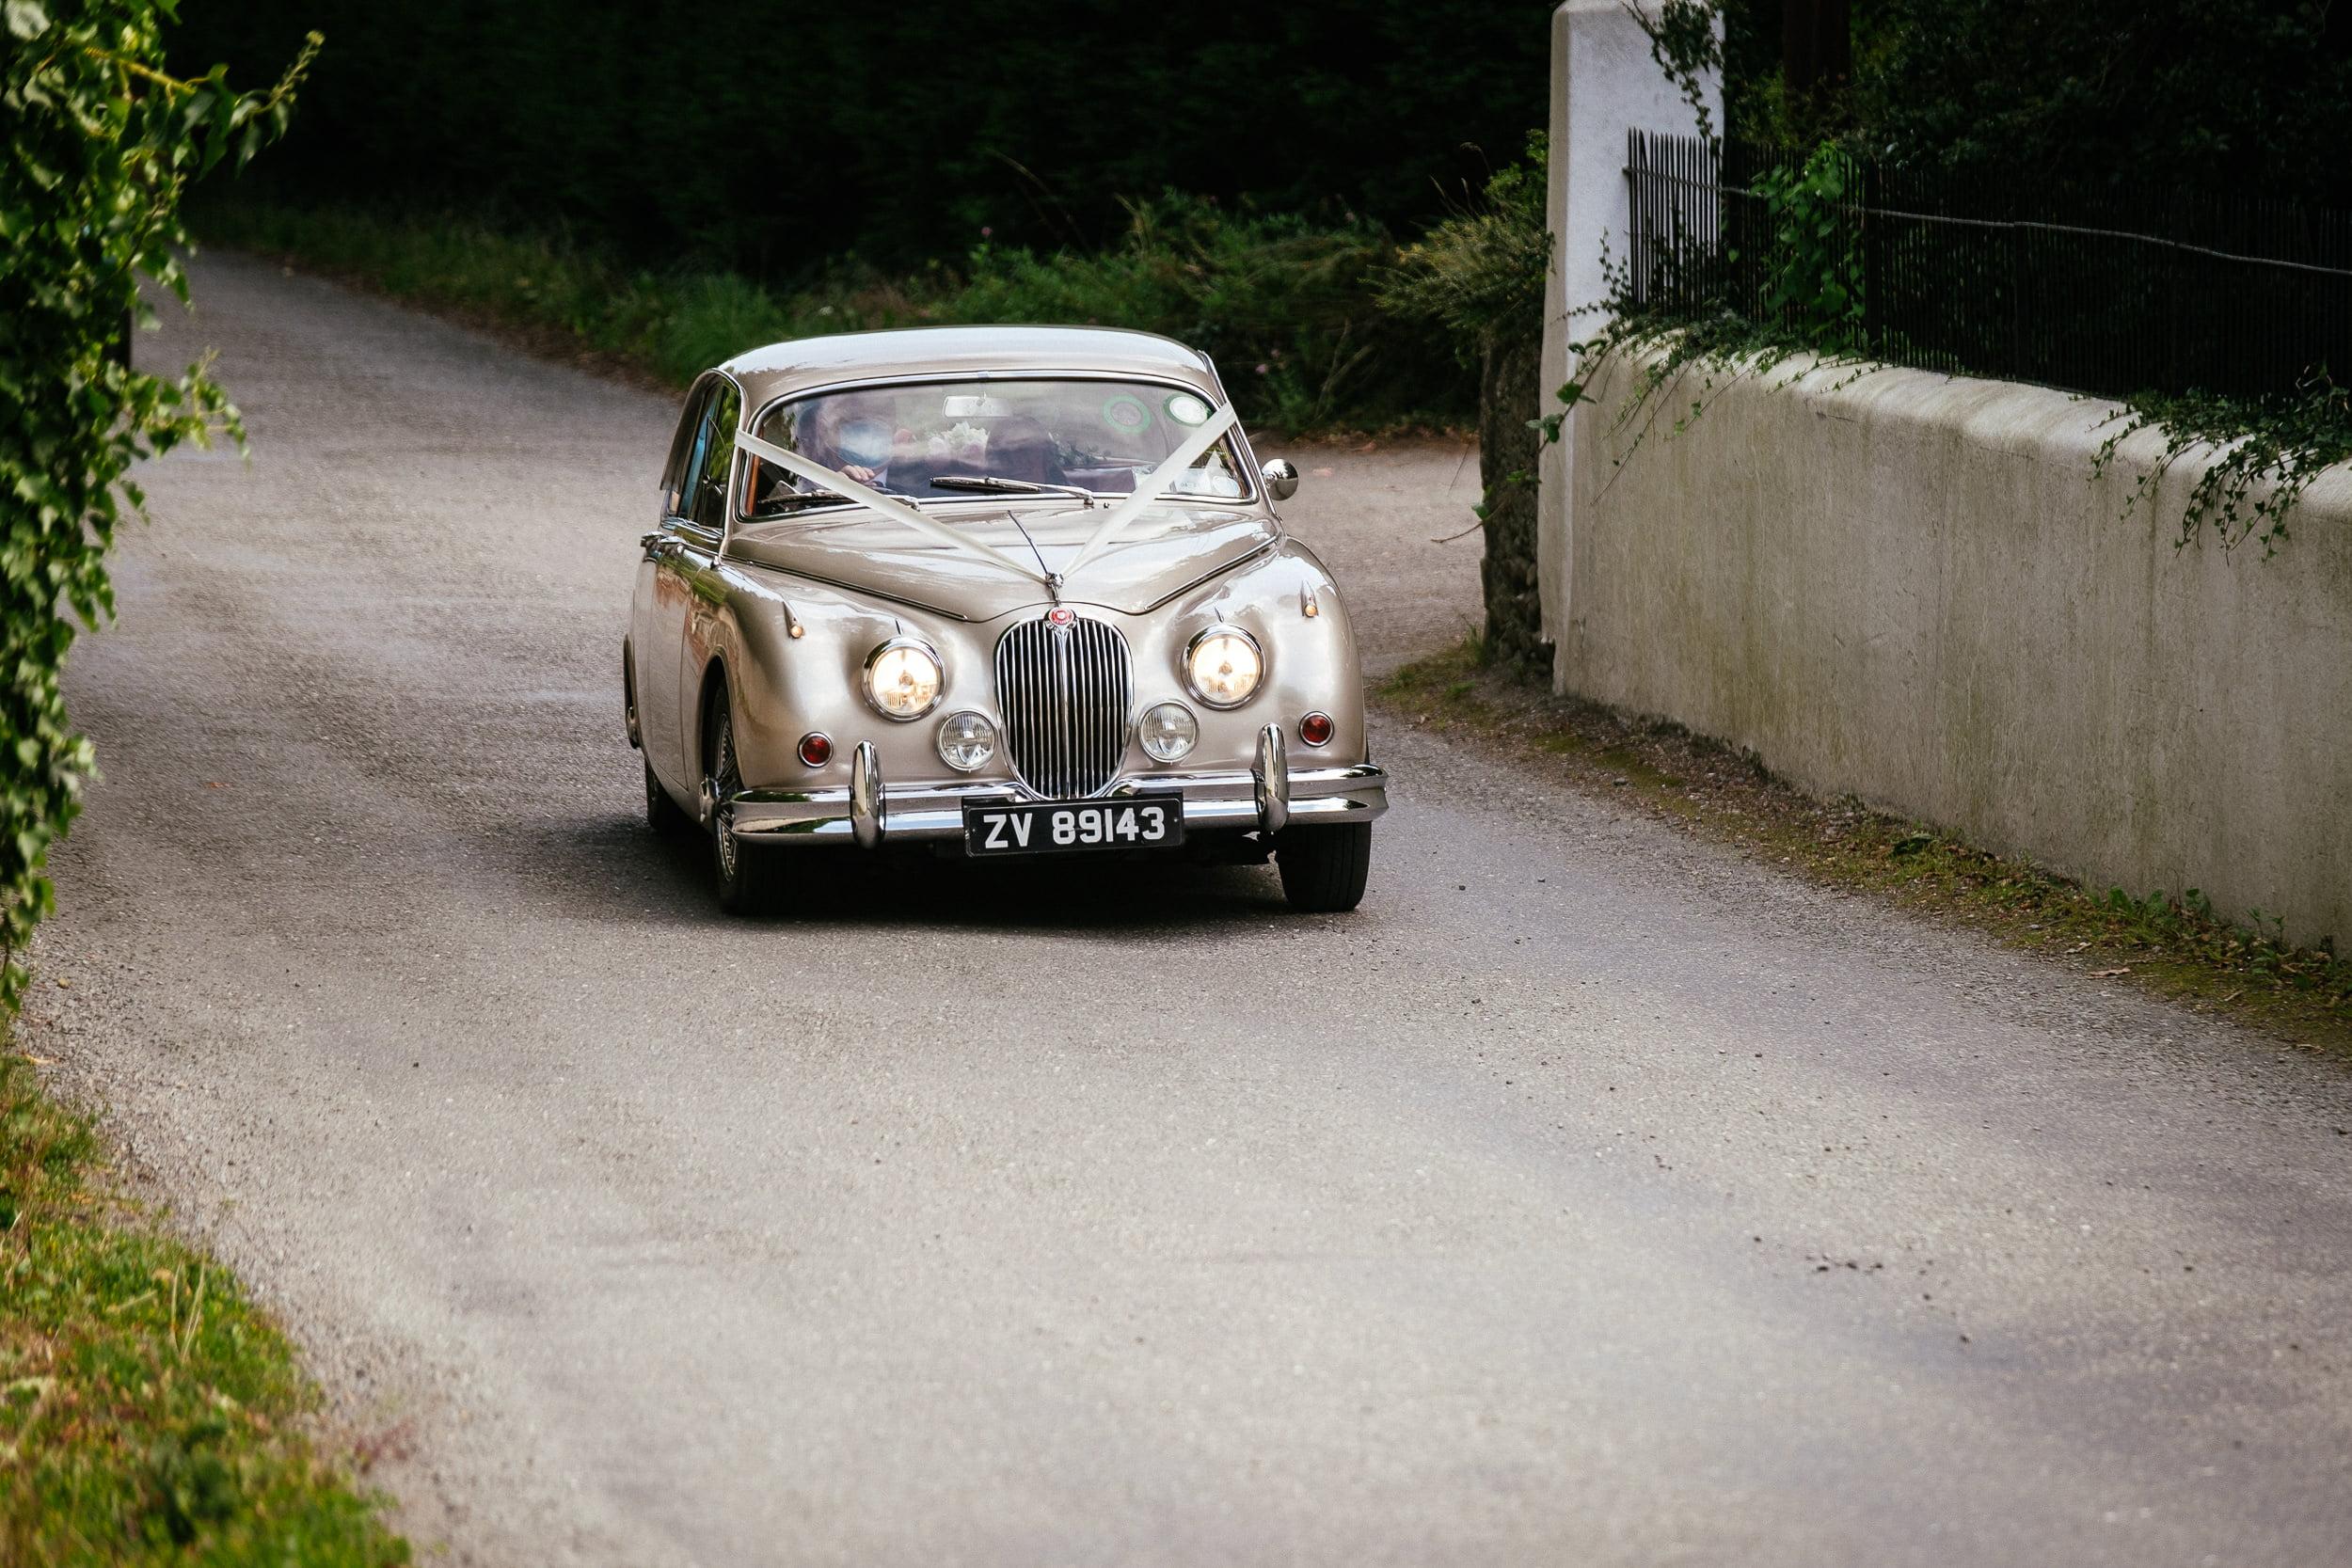 wedding car arriving at St. Patrick's Church, Kilquade